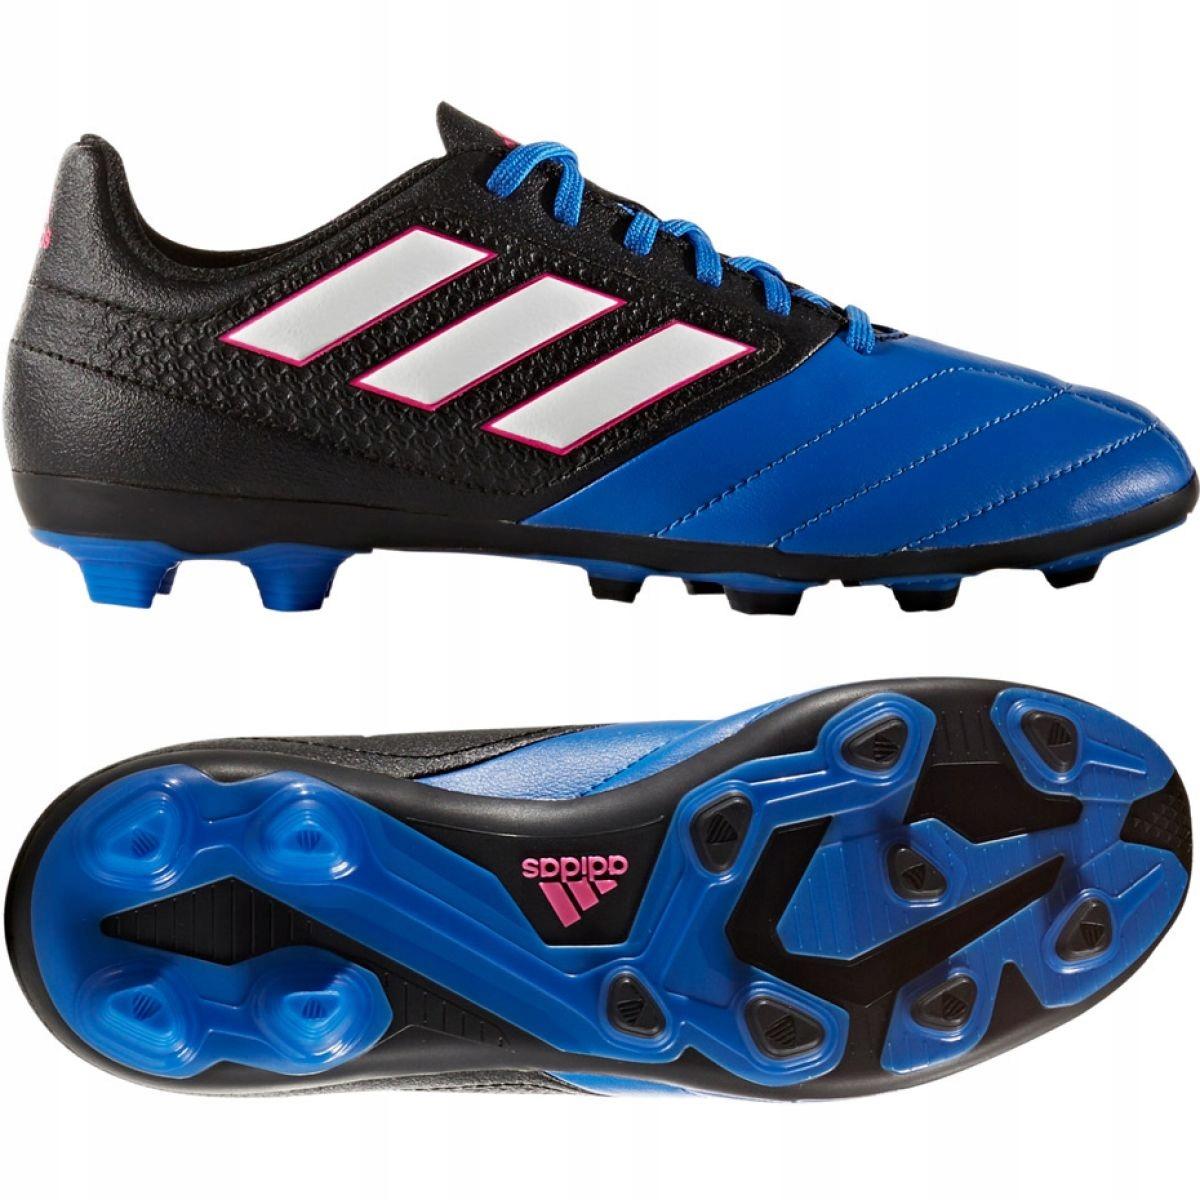 Buty adidas ACE 17.4 FxG JR BB5592 35,5